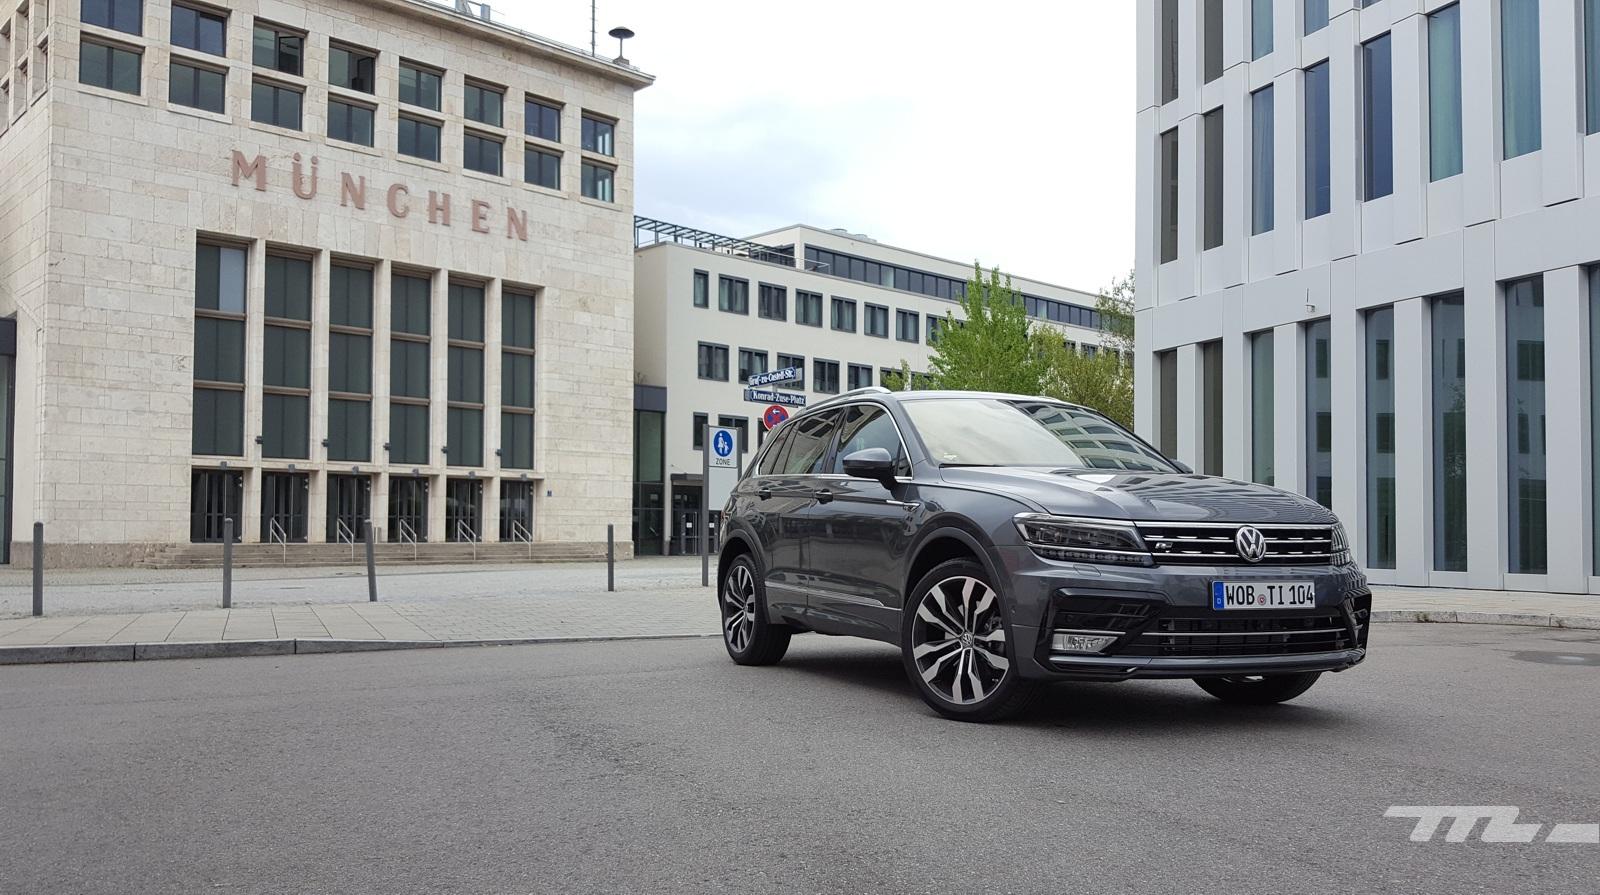 Volkswagen Tiguan 2016 2 0 Tdi Biturbo 240 Cv 4motion R